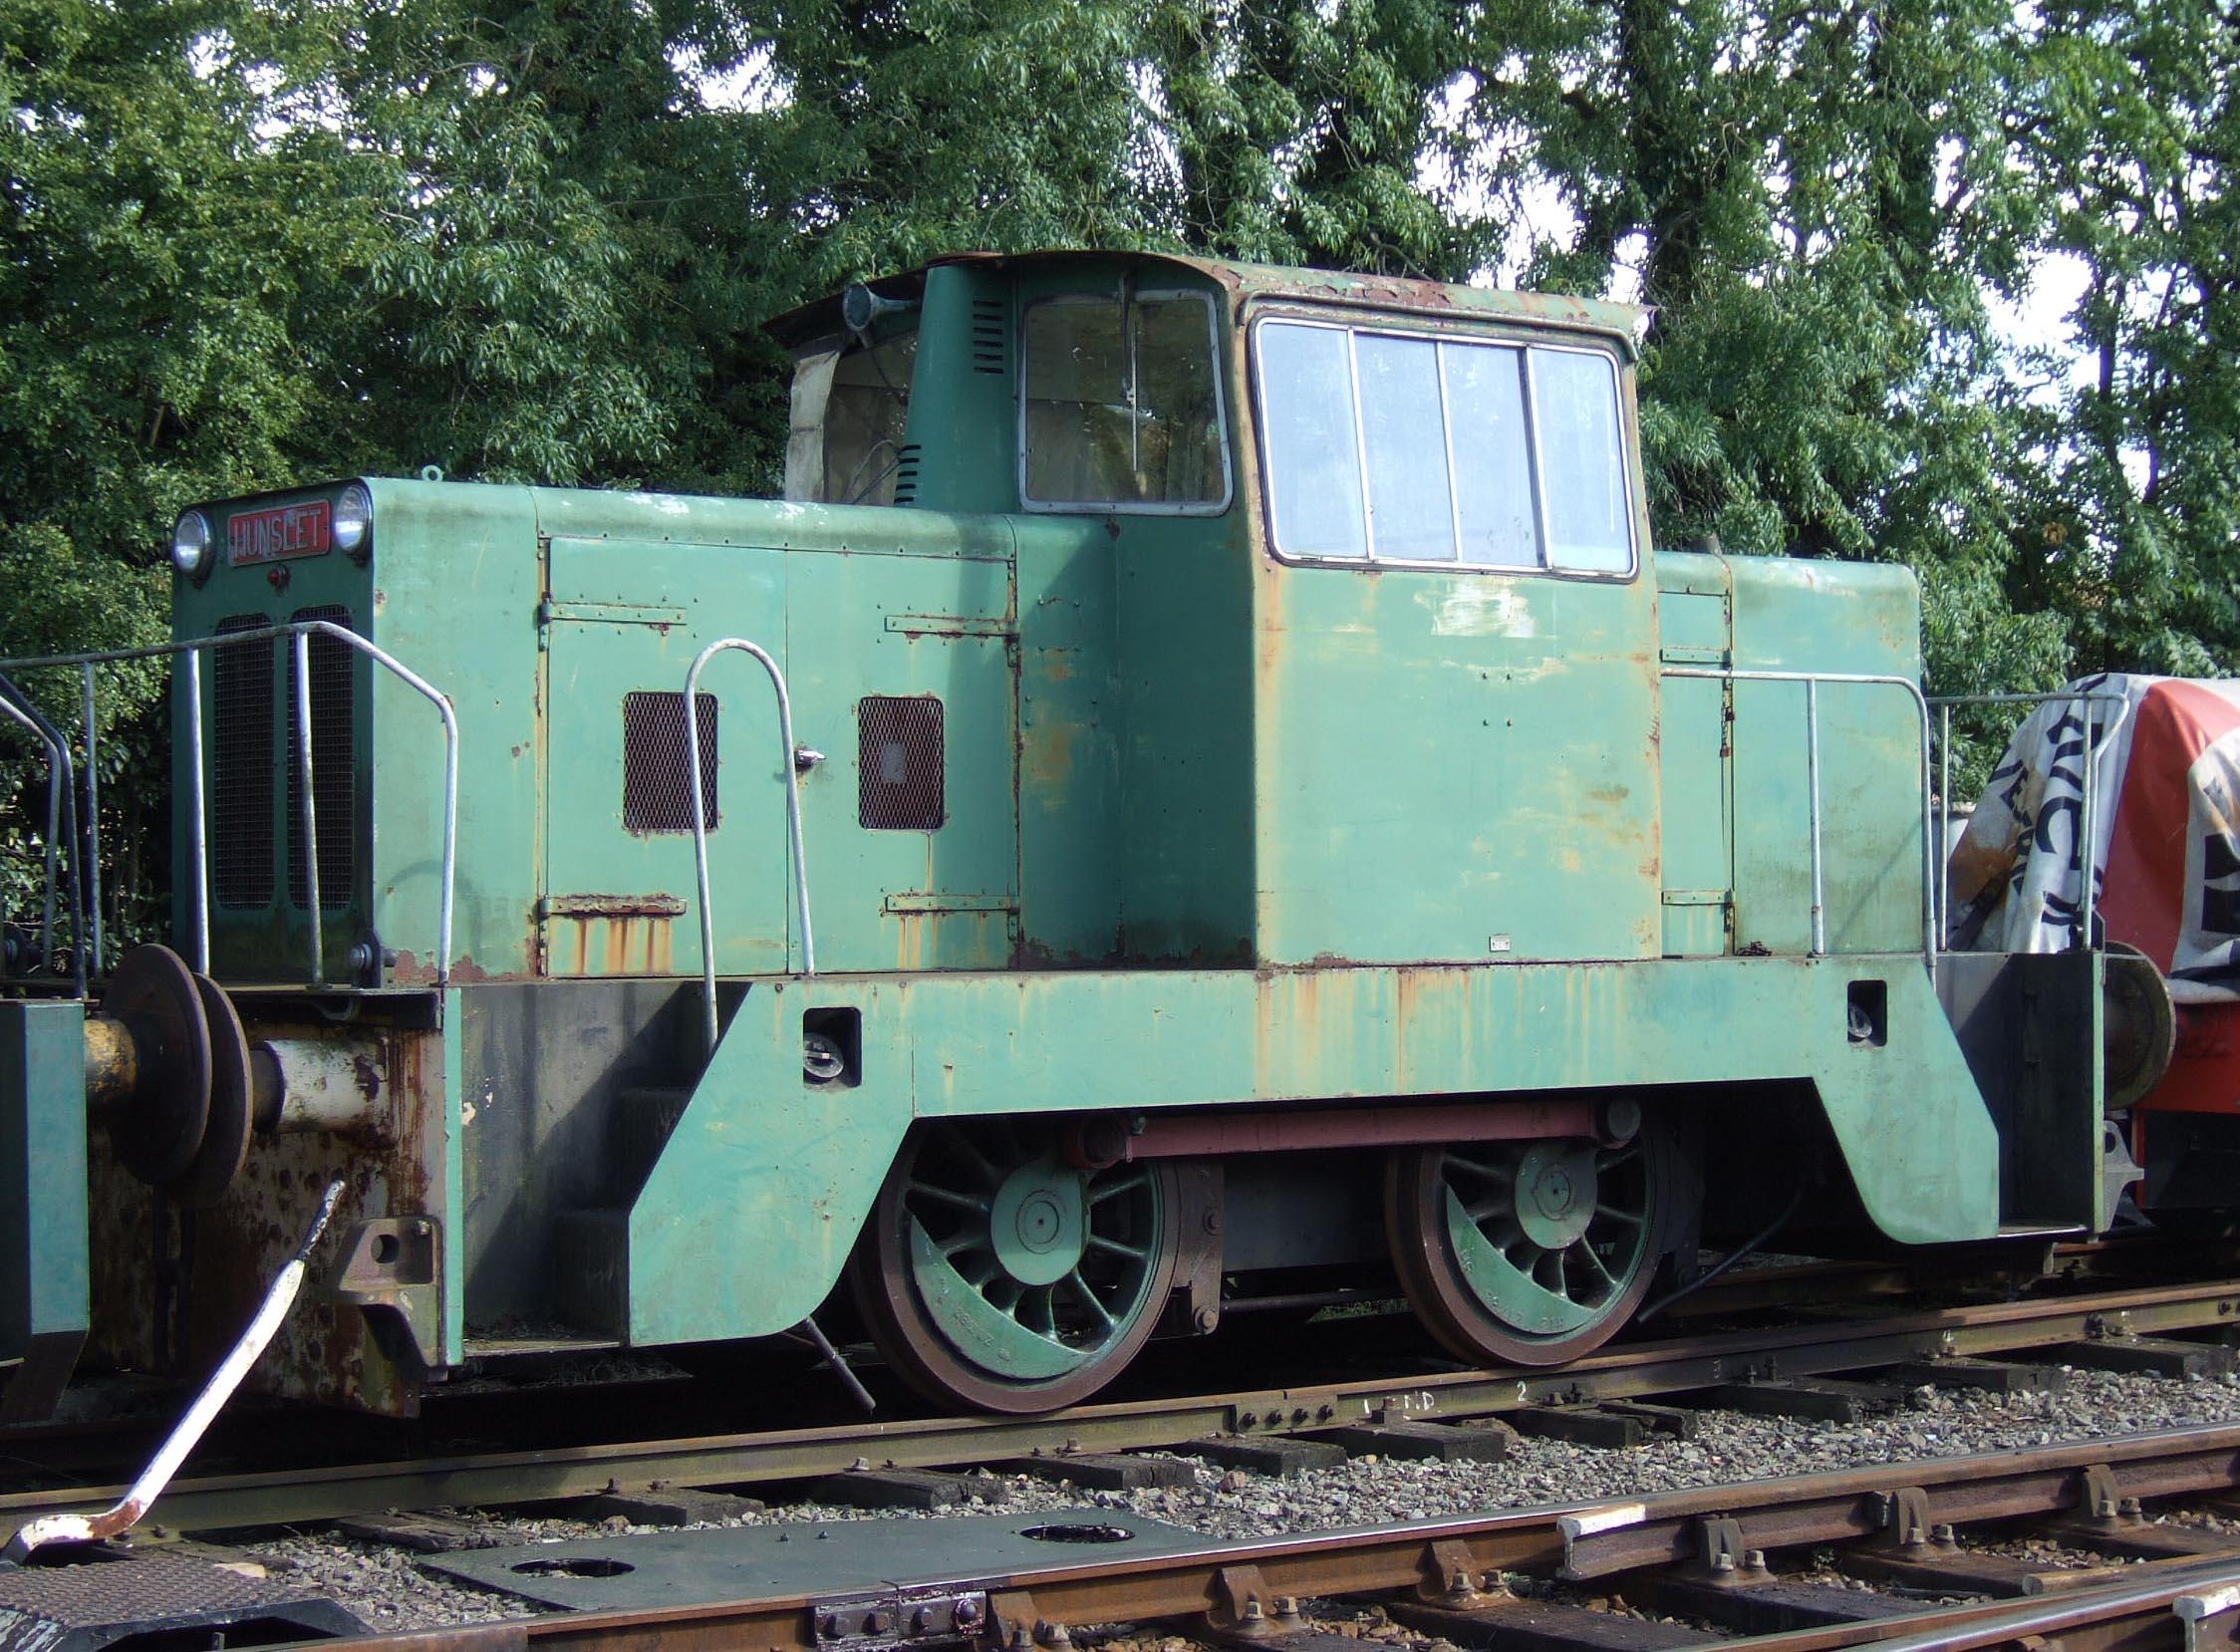 File:Hunslet 6688 at the Rutland Railway 05-09-25 38.jpeg